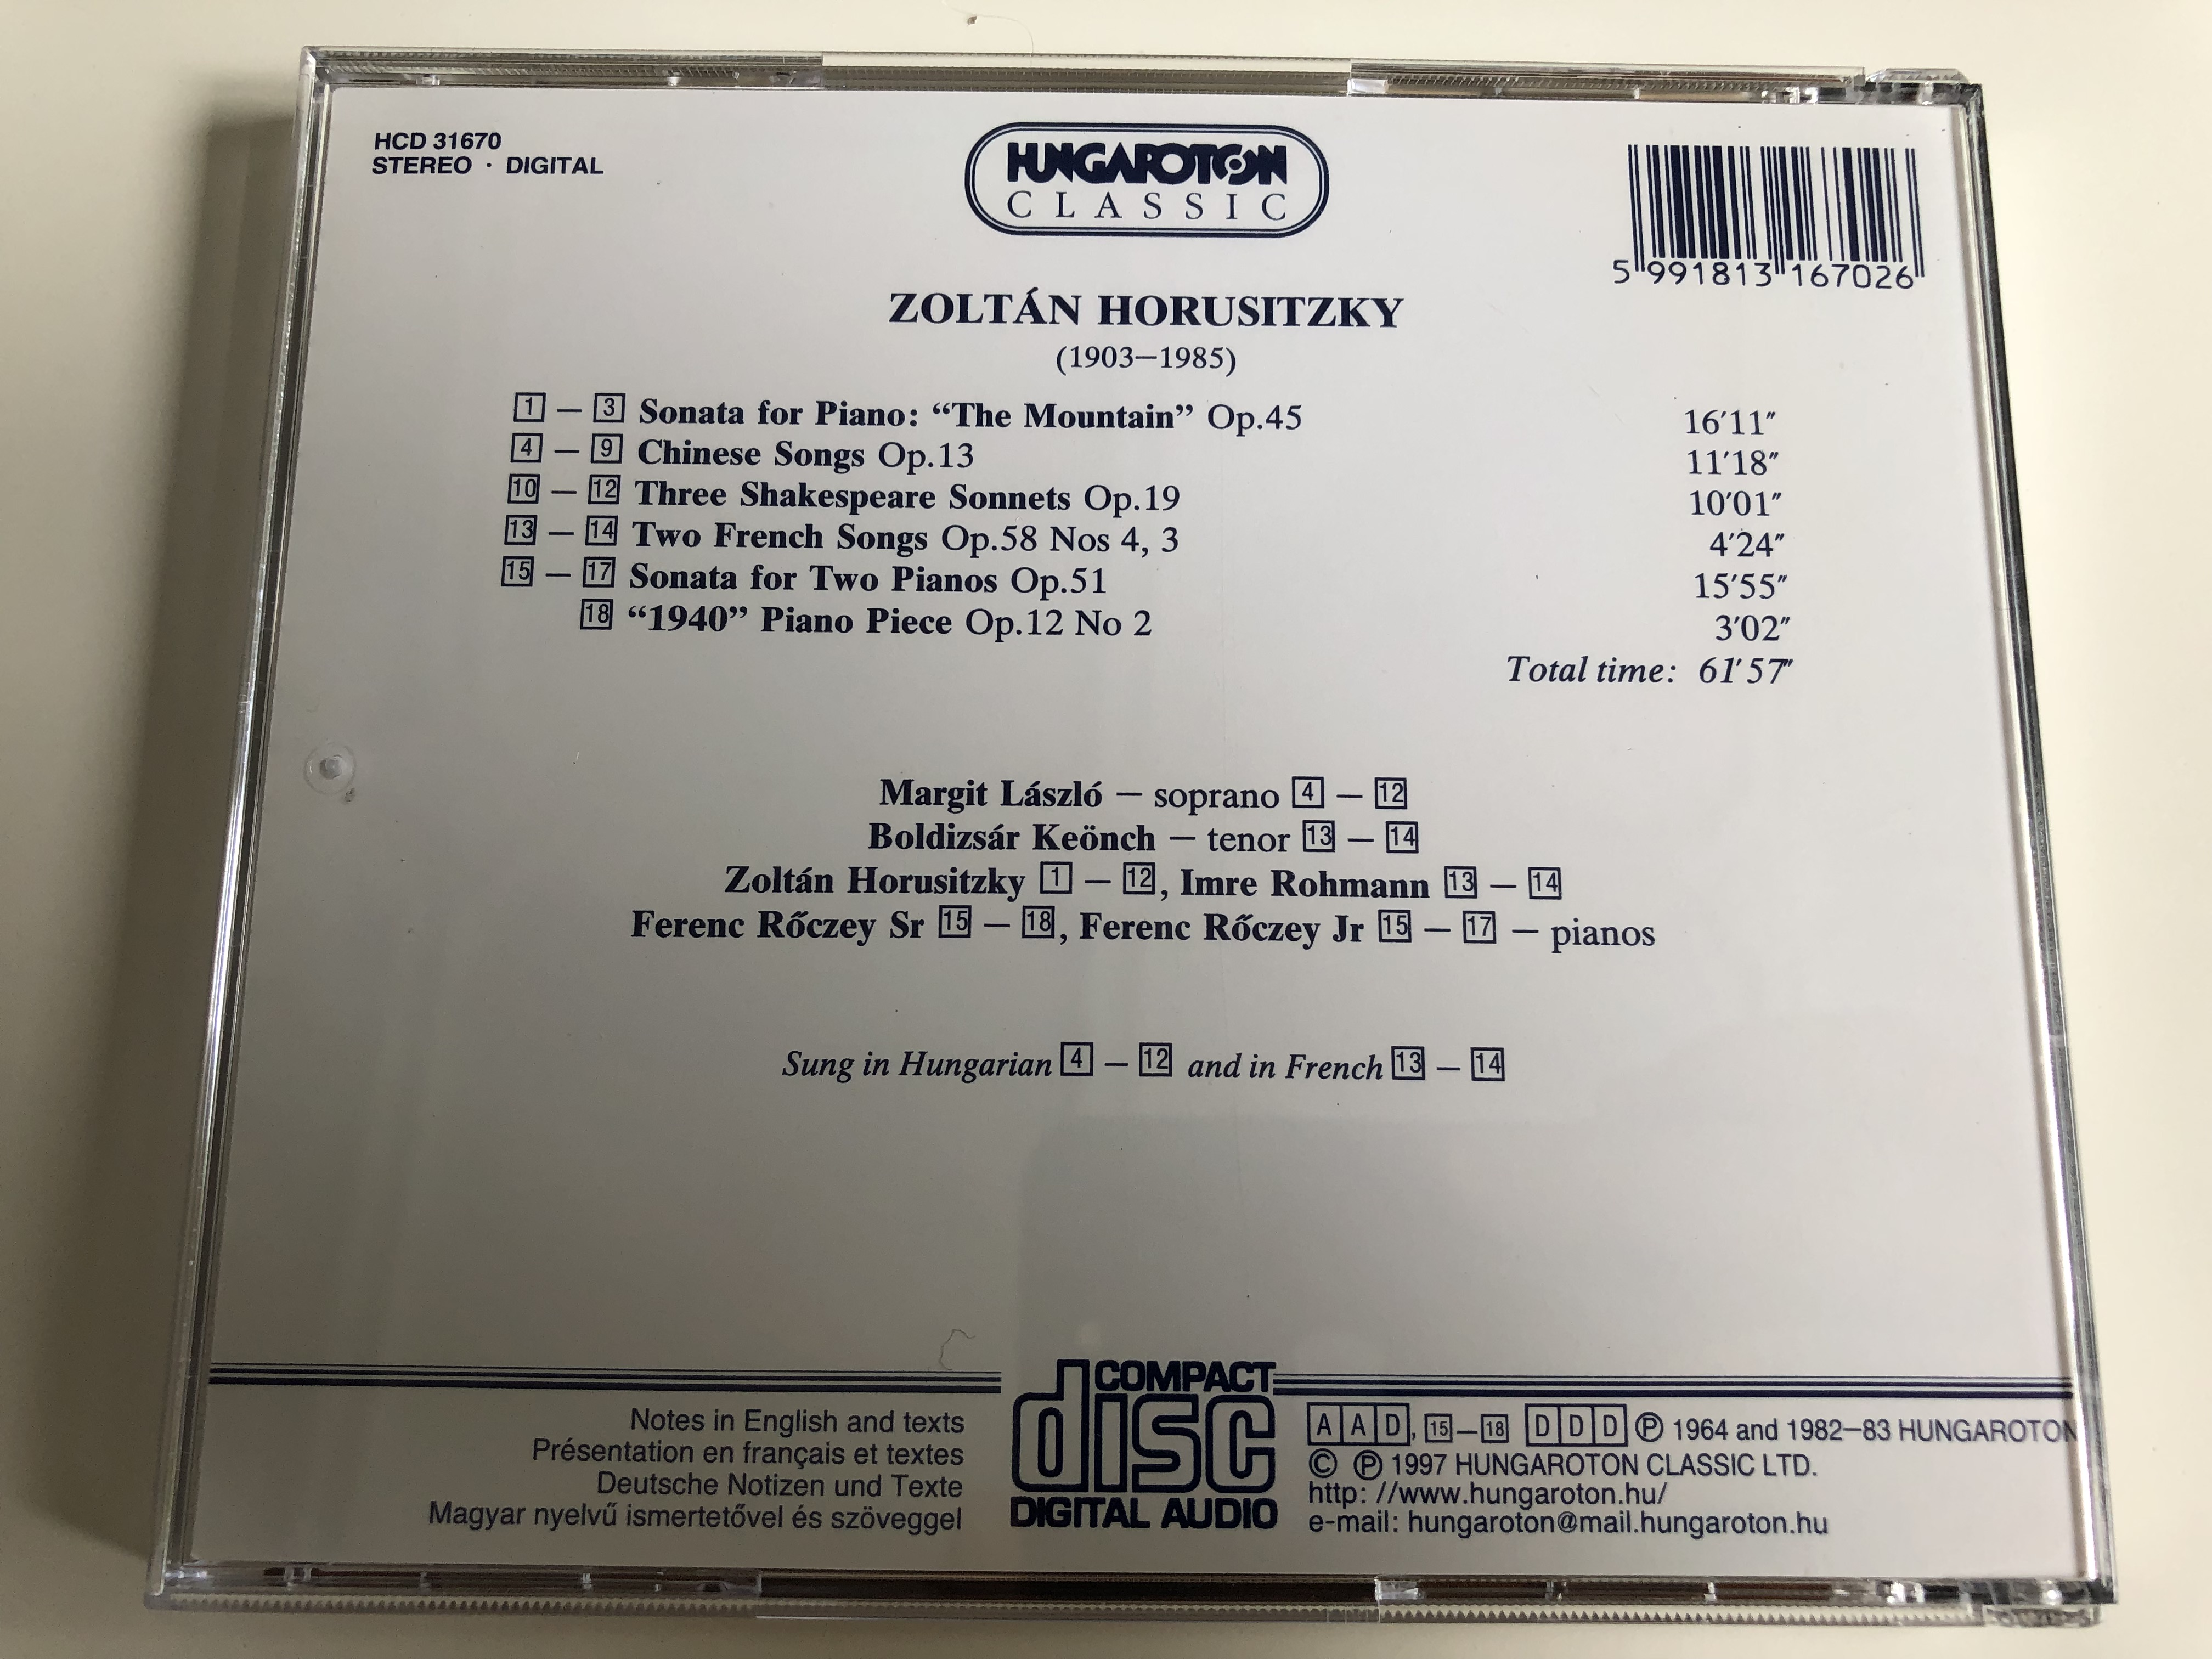 horusitzky-la-montagne-sonata-for-piano-op.-45-sonata-for-two-pianos-op.-51-chinese-songs-op-13.-margit-l-szl-soprano-boldizs-r-ke-nch-tenor-imre-rohmann-ferenc-r-czey-pianos-hcd-31670-hungaroton-audio-cd-1997-1-6553724-.jpg